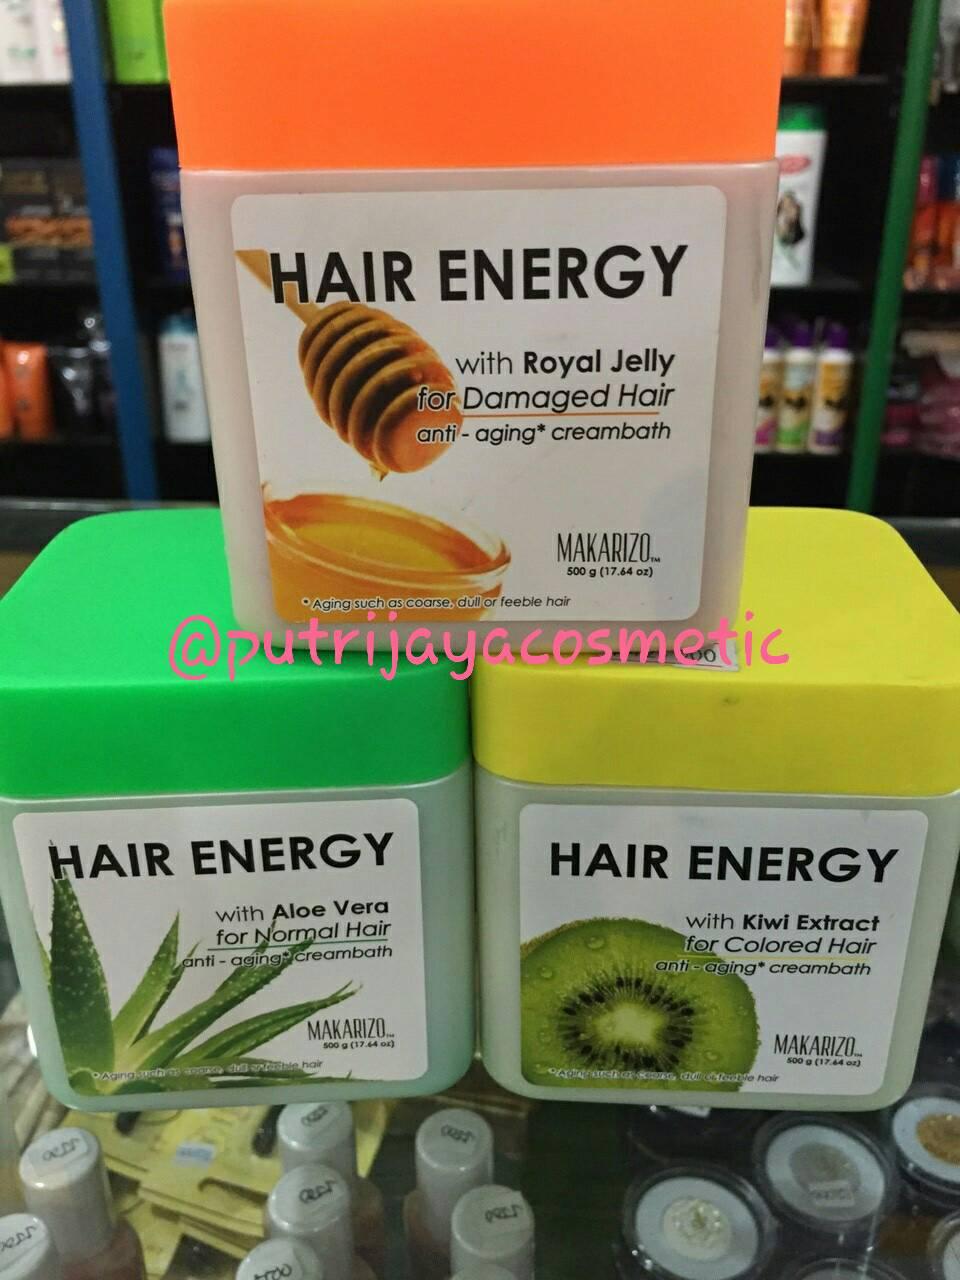 Makarizo Creambath Hair Energy Kiwi Extract Anti Aging 500gr Aloe Ampamp Melon Sachet 30 Gr Color 60 Cek Harga Source 6 Sachets Jual